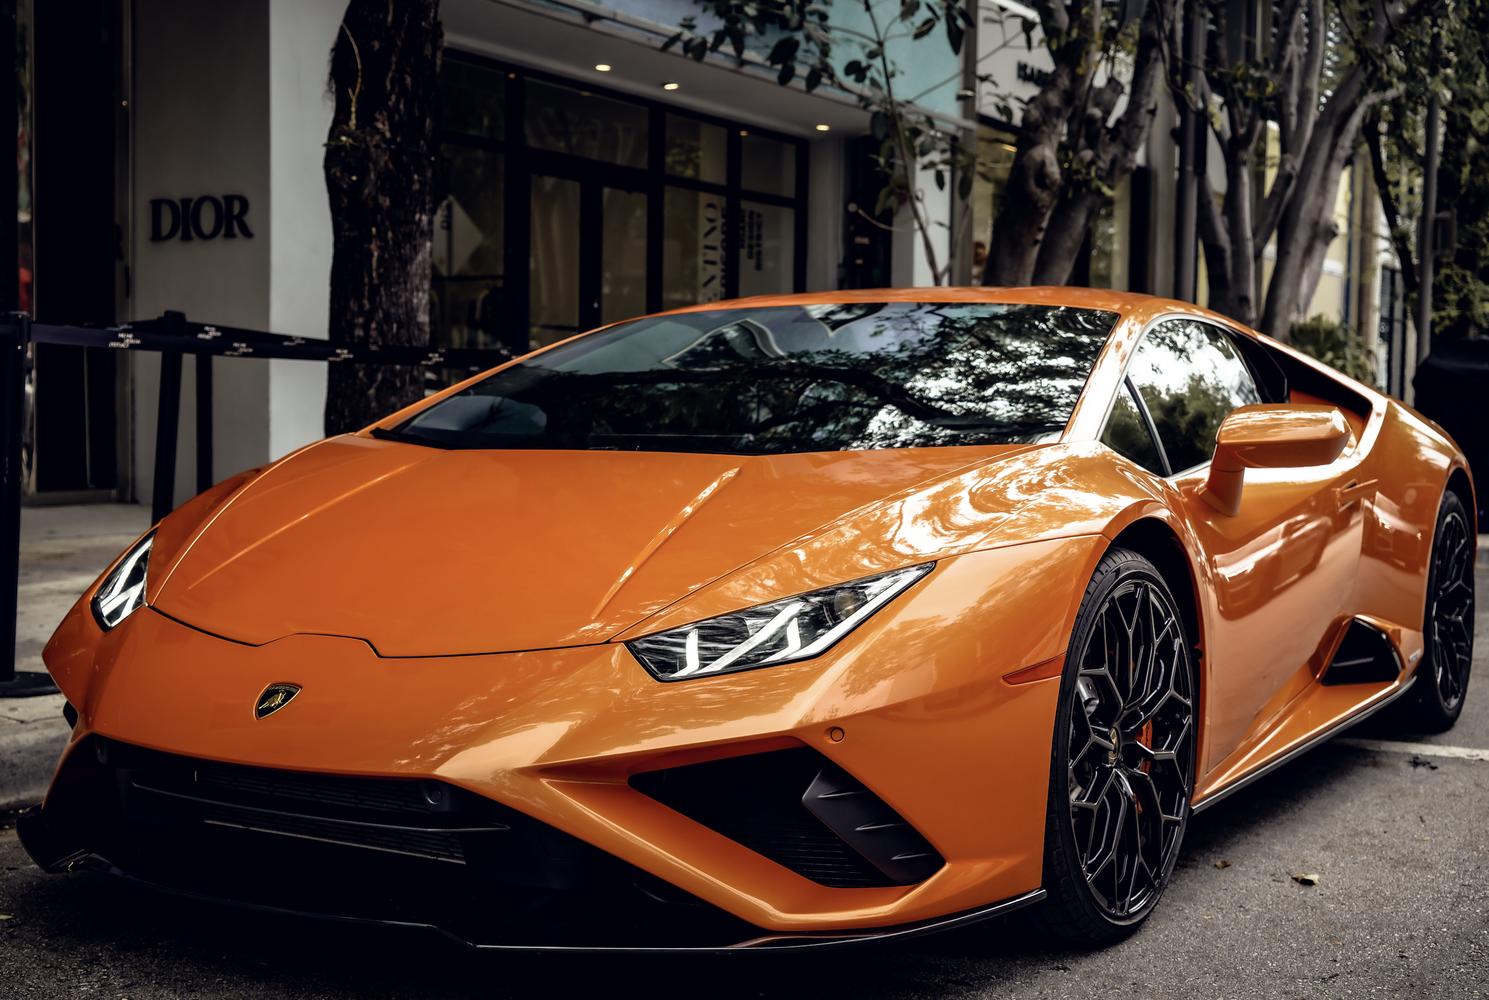 Image #3 of our  Lamborghini Huracan EVO Orange Coupe    In Miami Fort Lauderdale Palm Beach South Florida